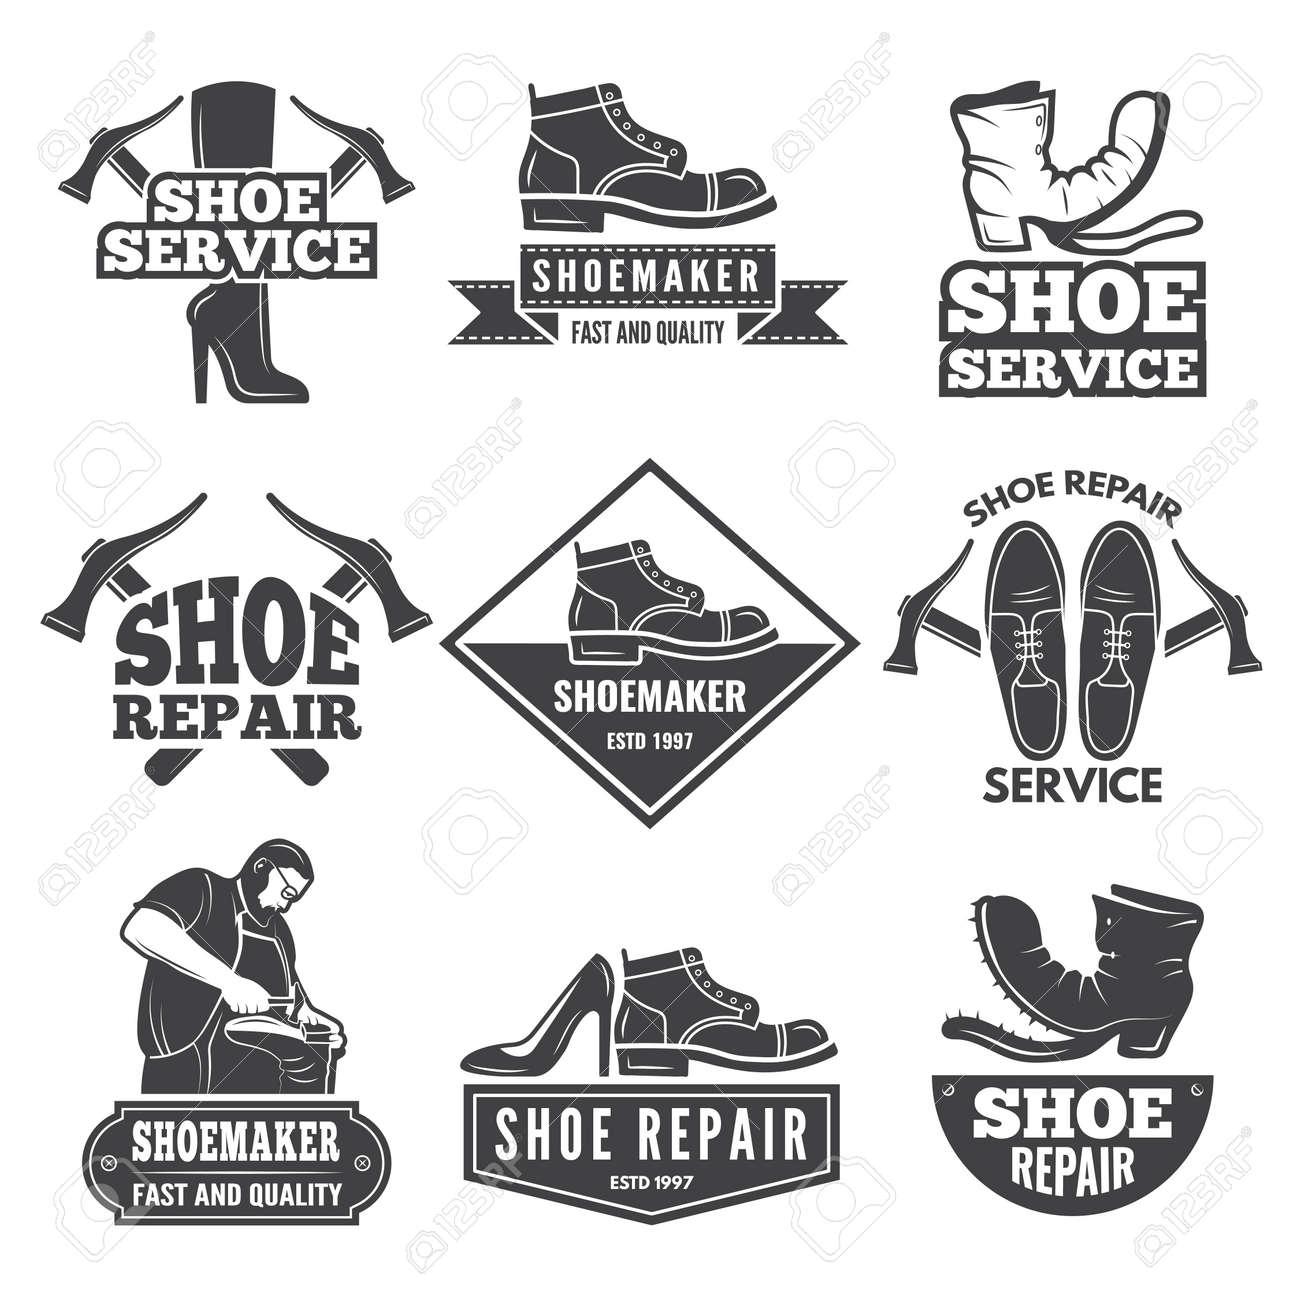 Vintage monochrome labels and logos for shoe repair workshop. Repair shoe emblem, badge shoemaker company. Vector illustration - 166842650